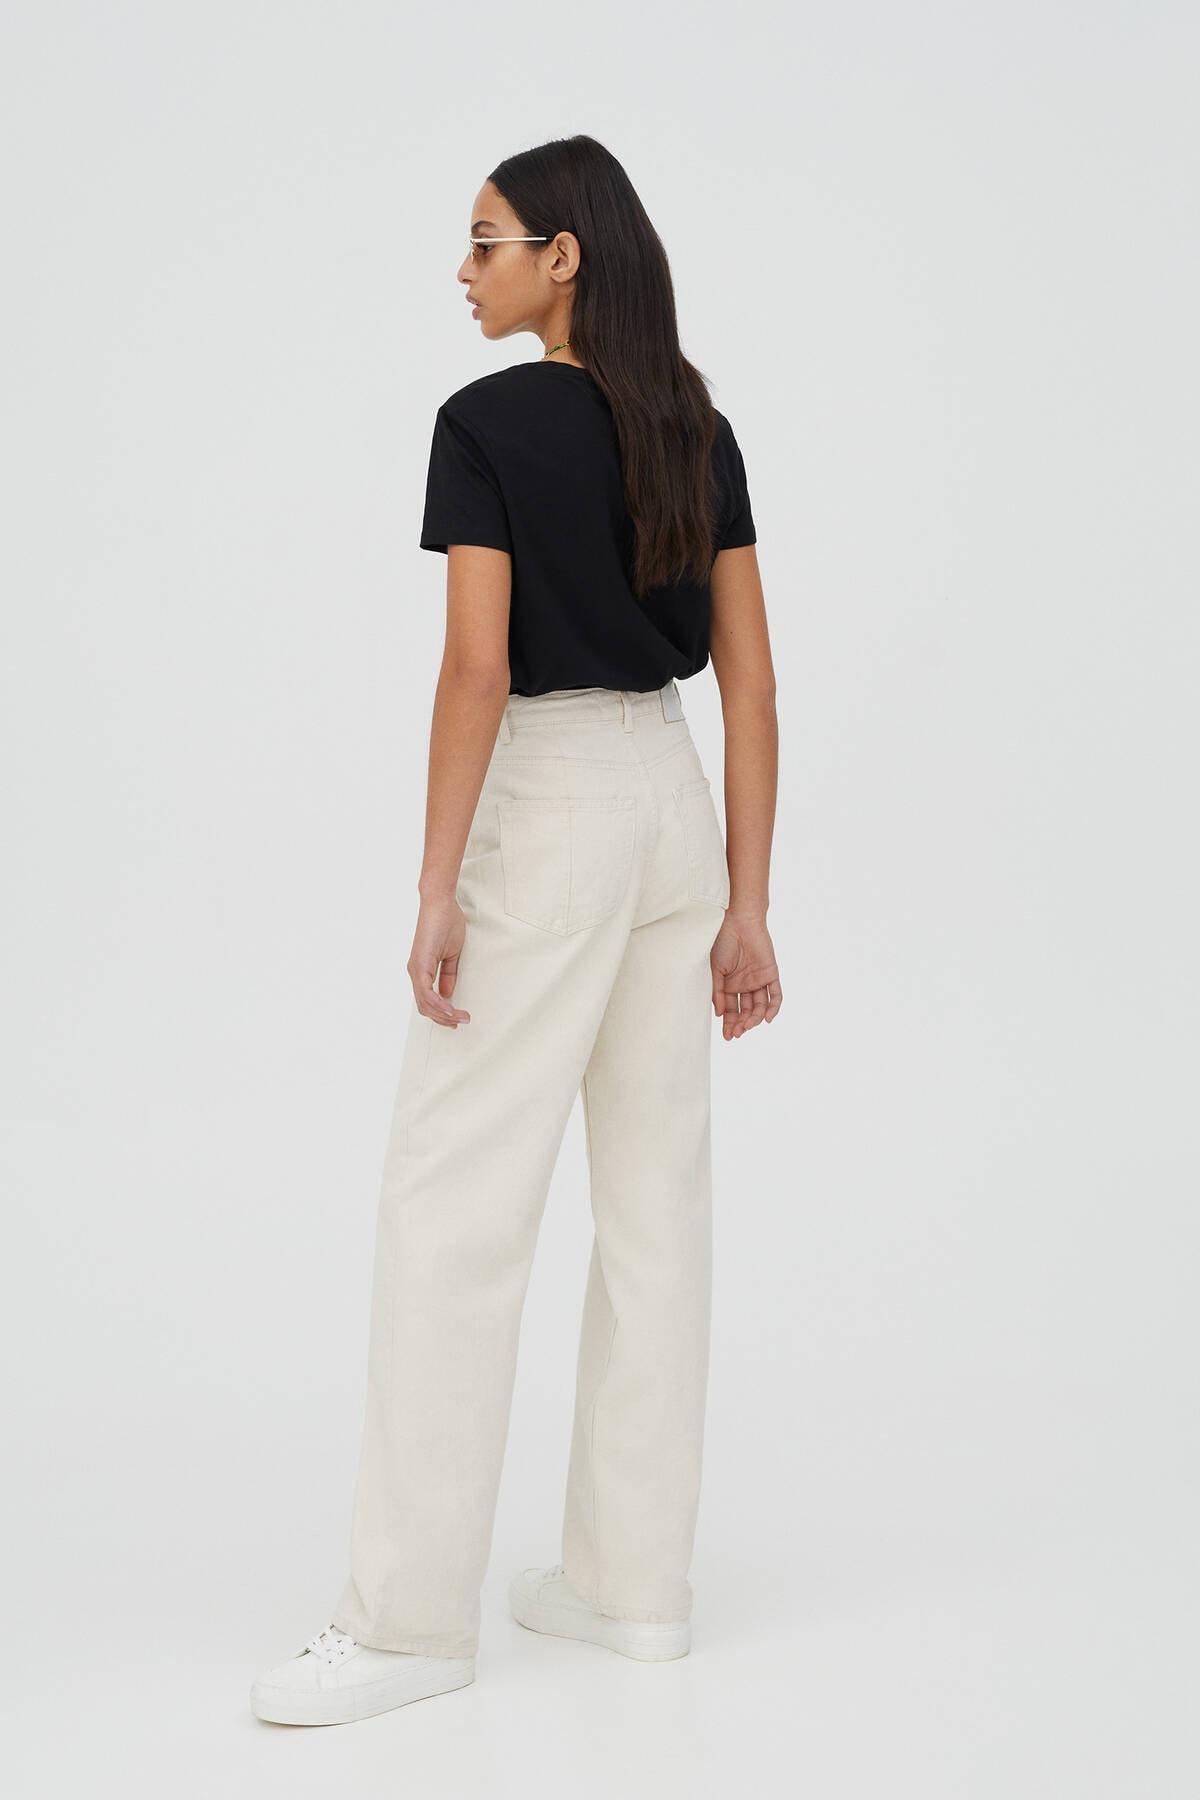 Pull & Bear Kadın Kontrast Sloganlı Siyah T-Shirt - %100 Organik Pamuklu 04240310 2